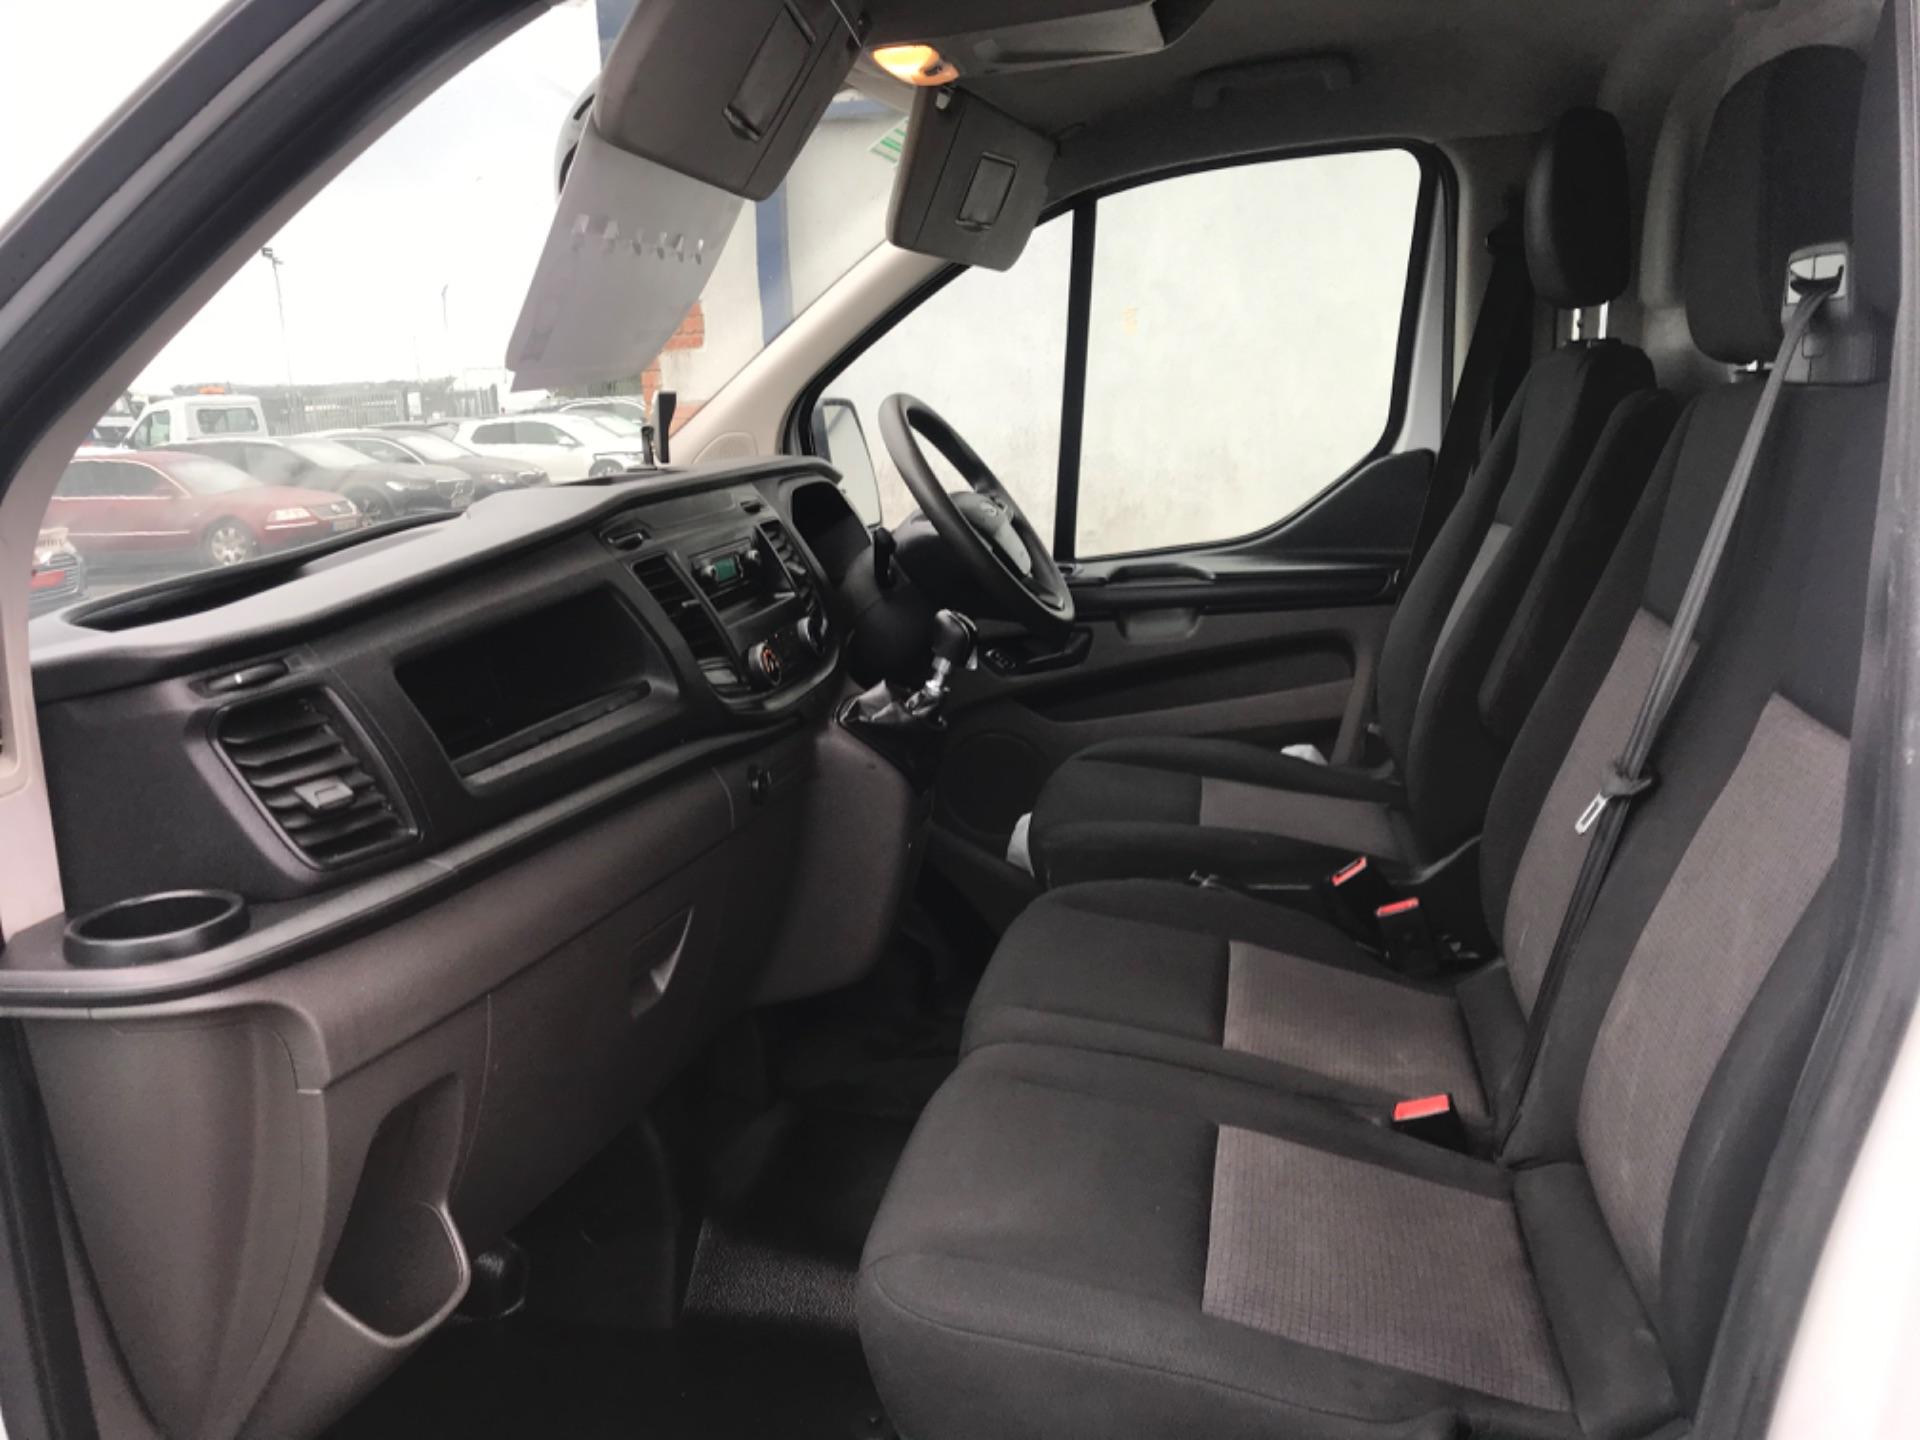 2018 Ford Transit Custom Custom 300 Lbase 2.0 105PS 3DR (181D27029) Image 11